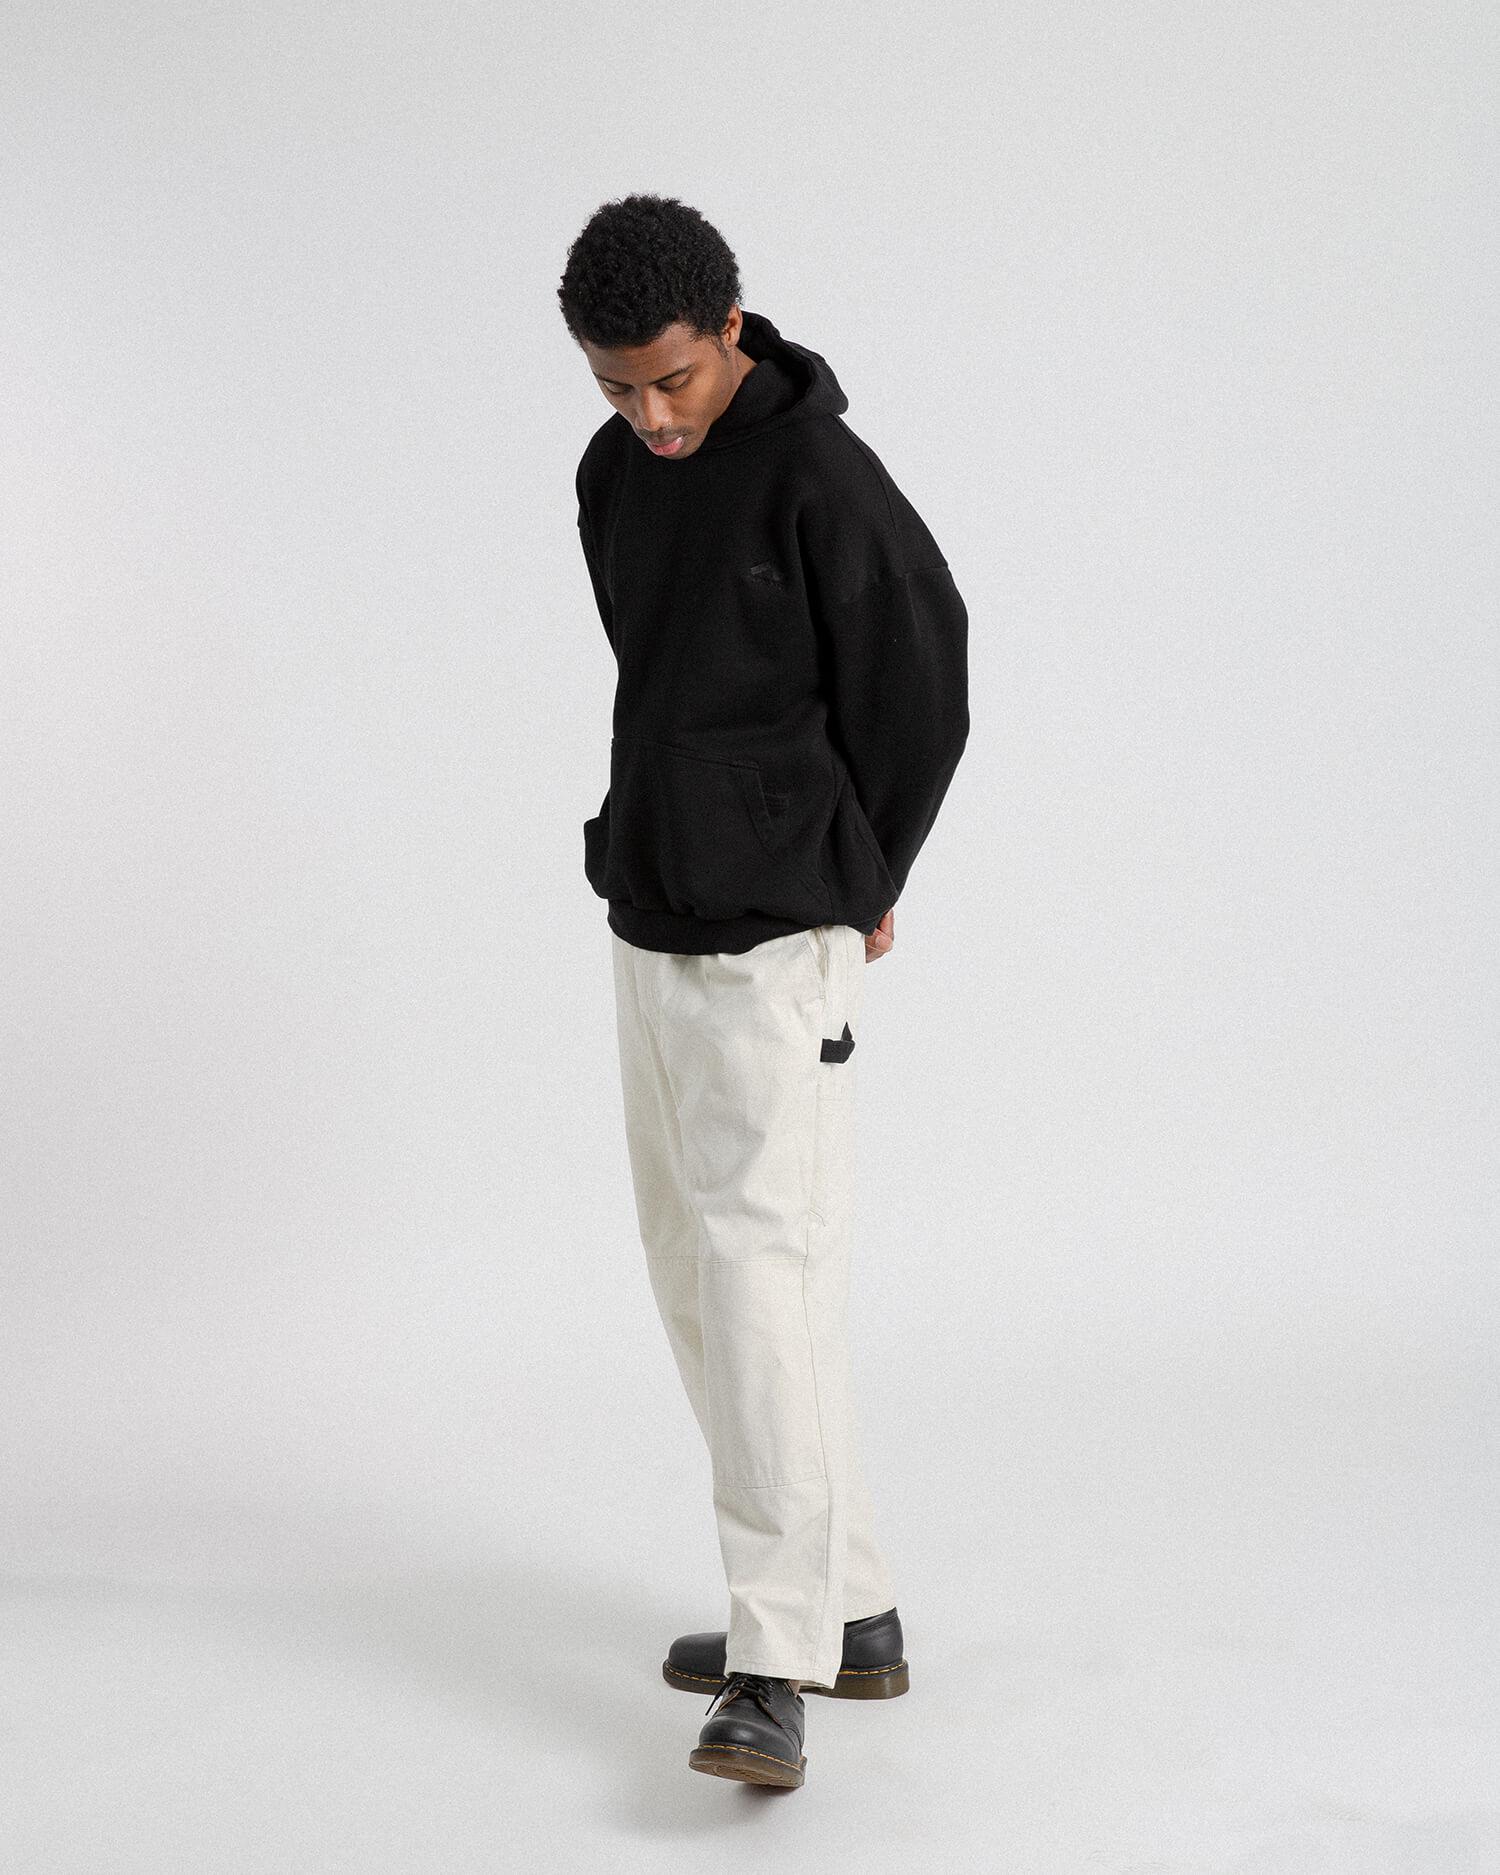 male model wearing favorite hoodie front view